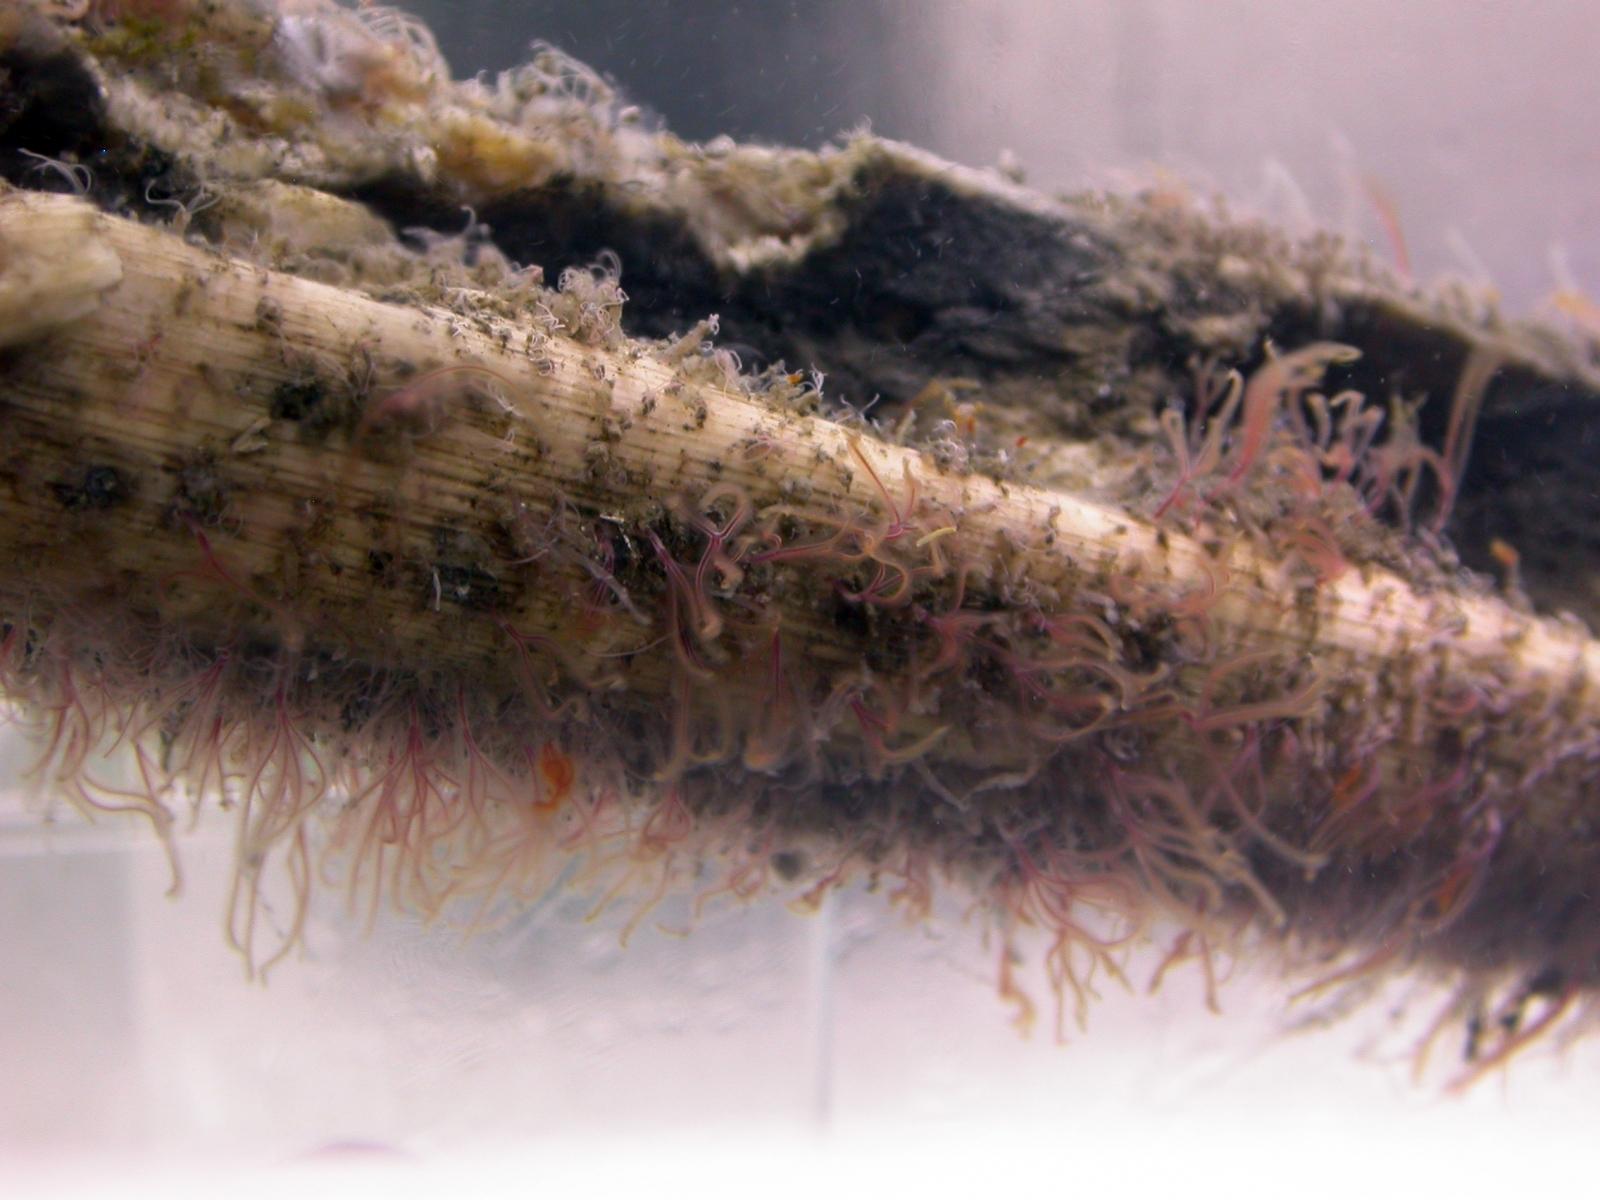 zombie worms